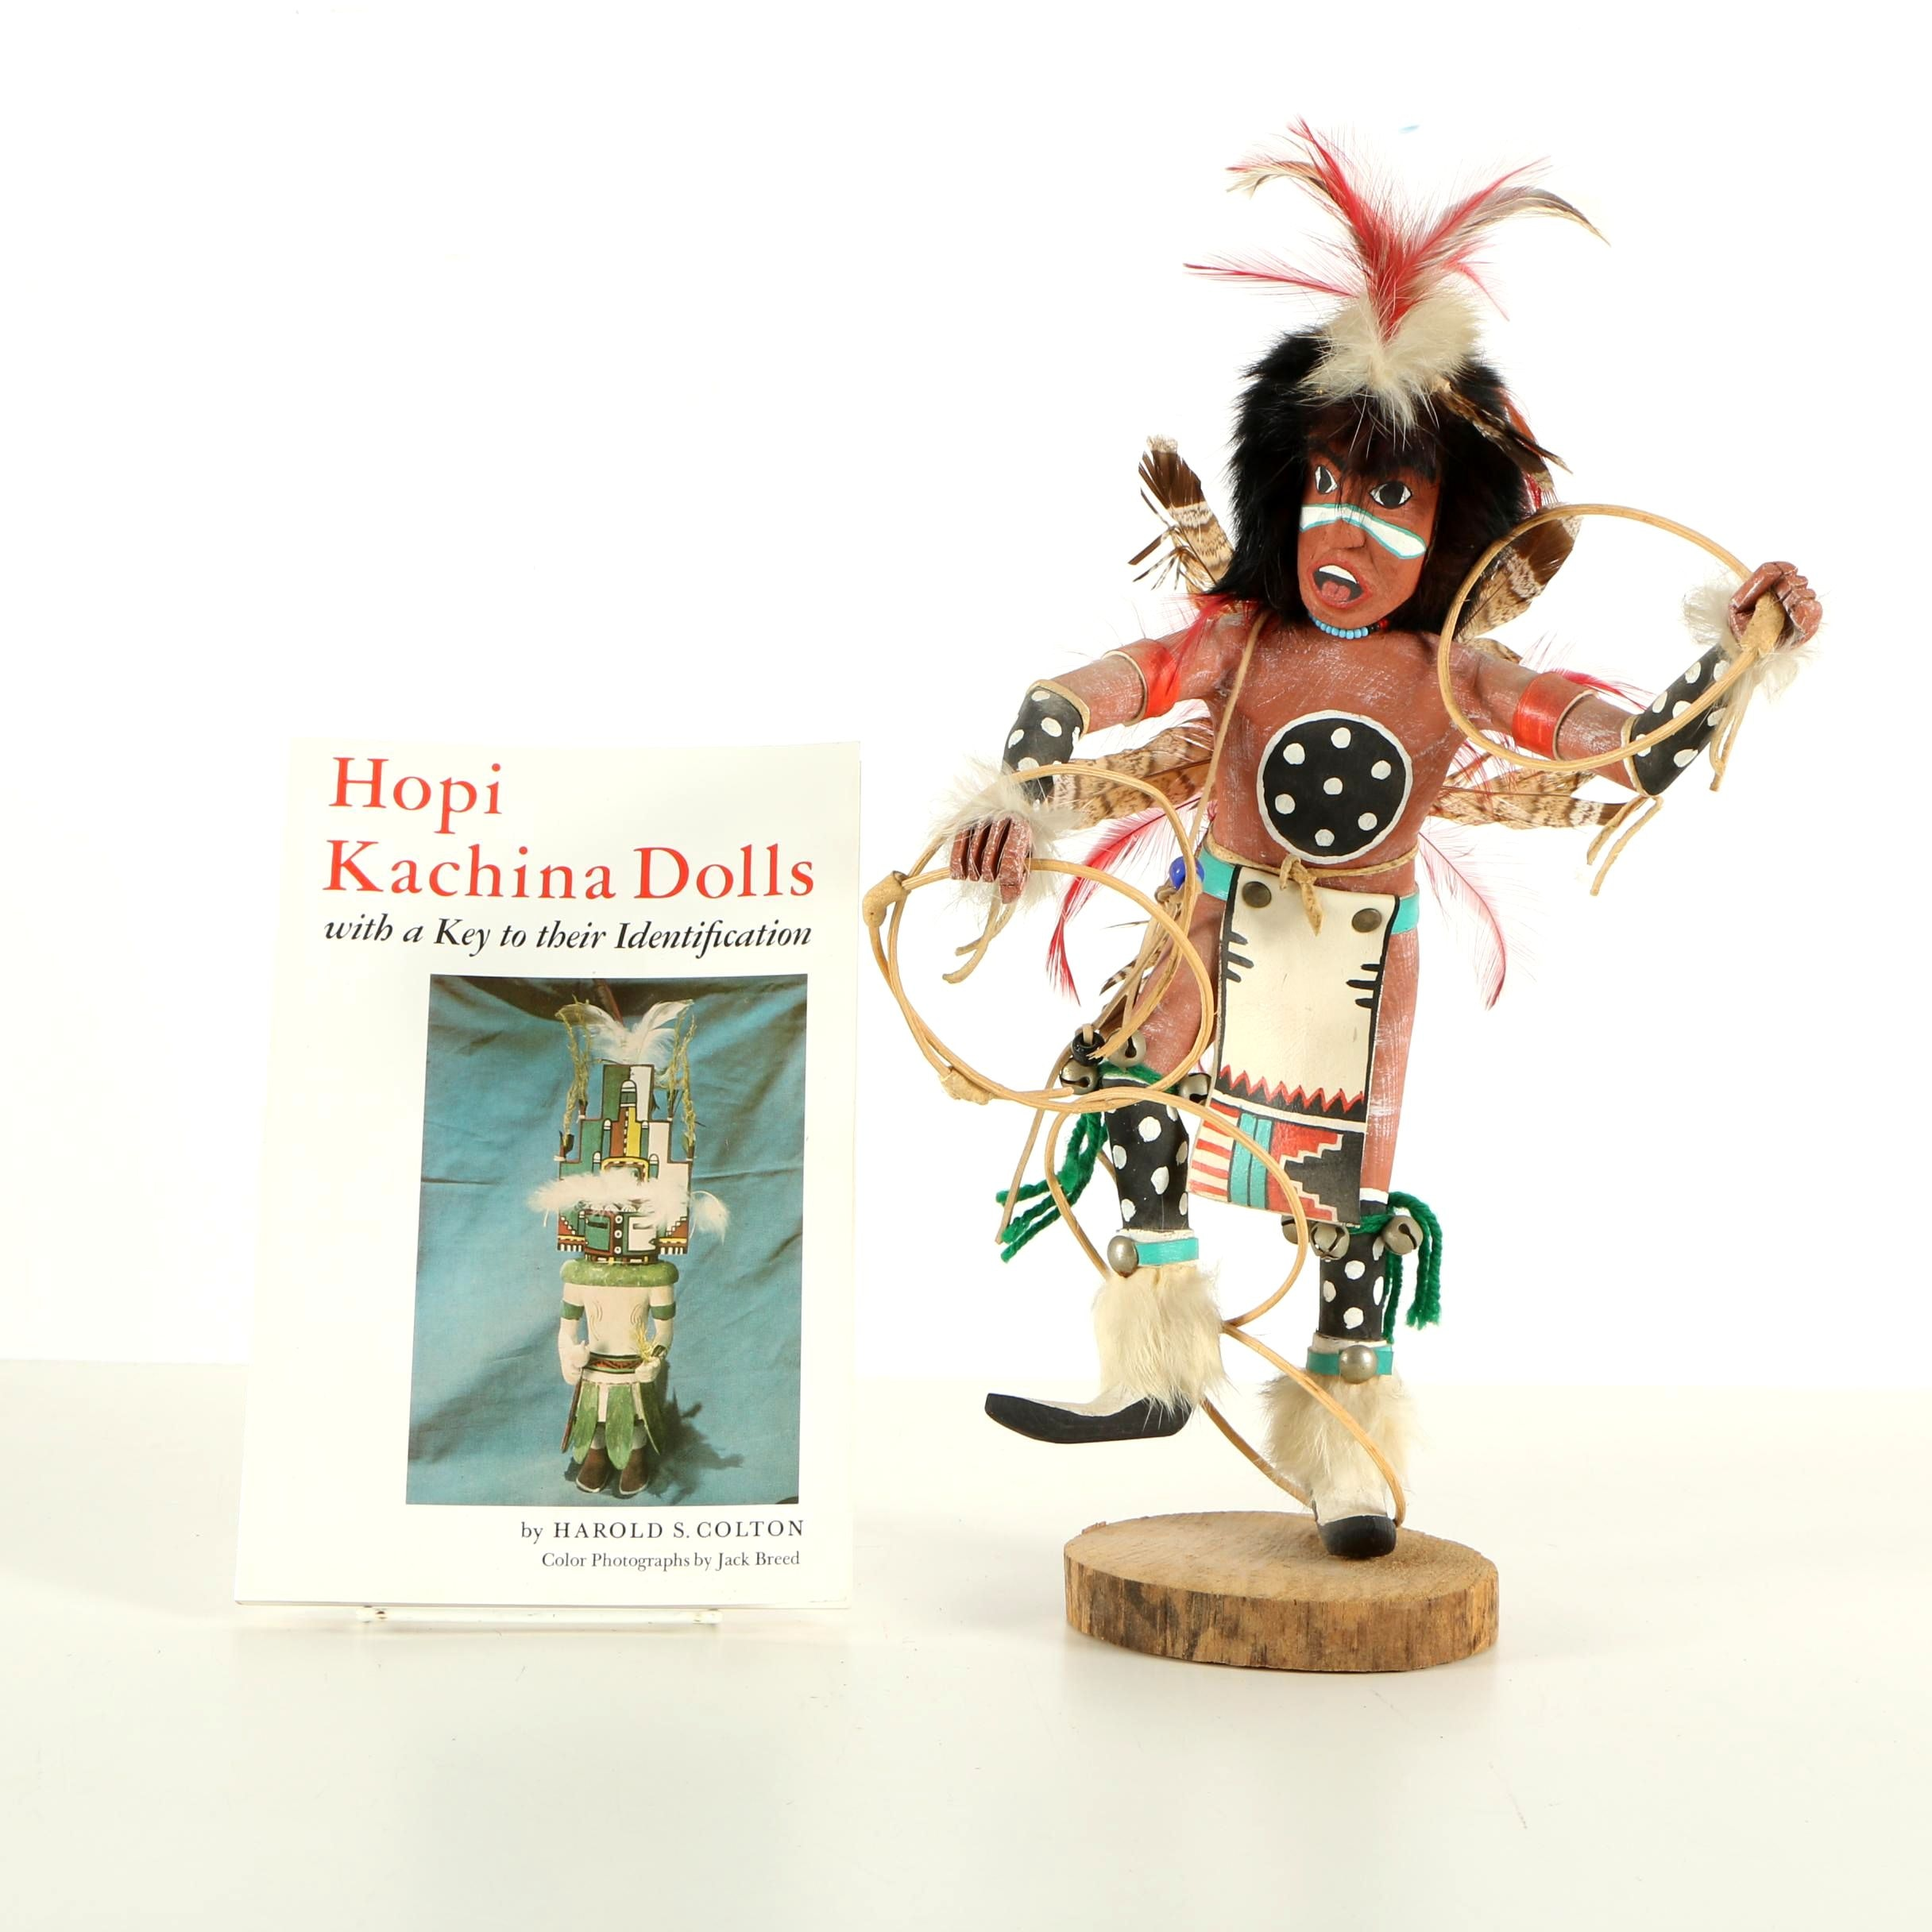 """Hopi Kachina Dolls"" and A. Largo Kachina Doll ""Hoop Dancer"""